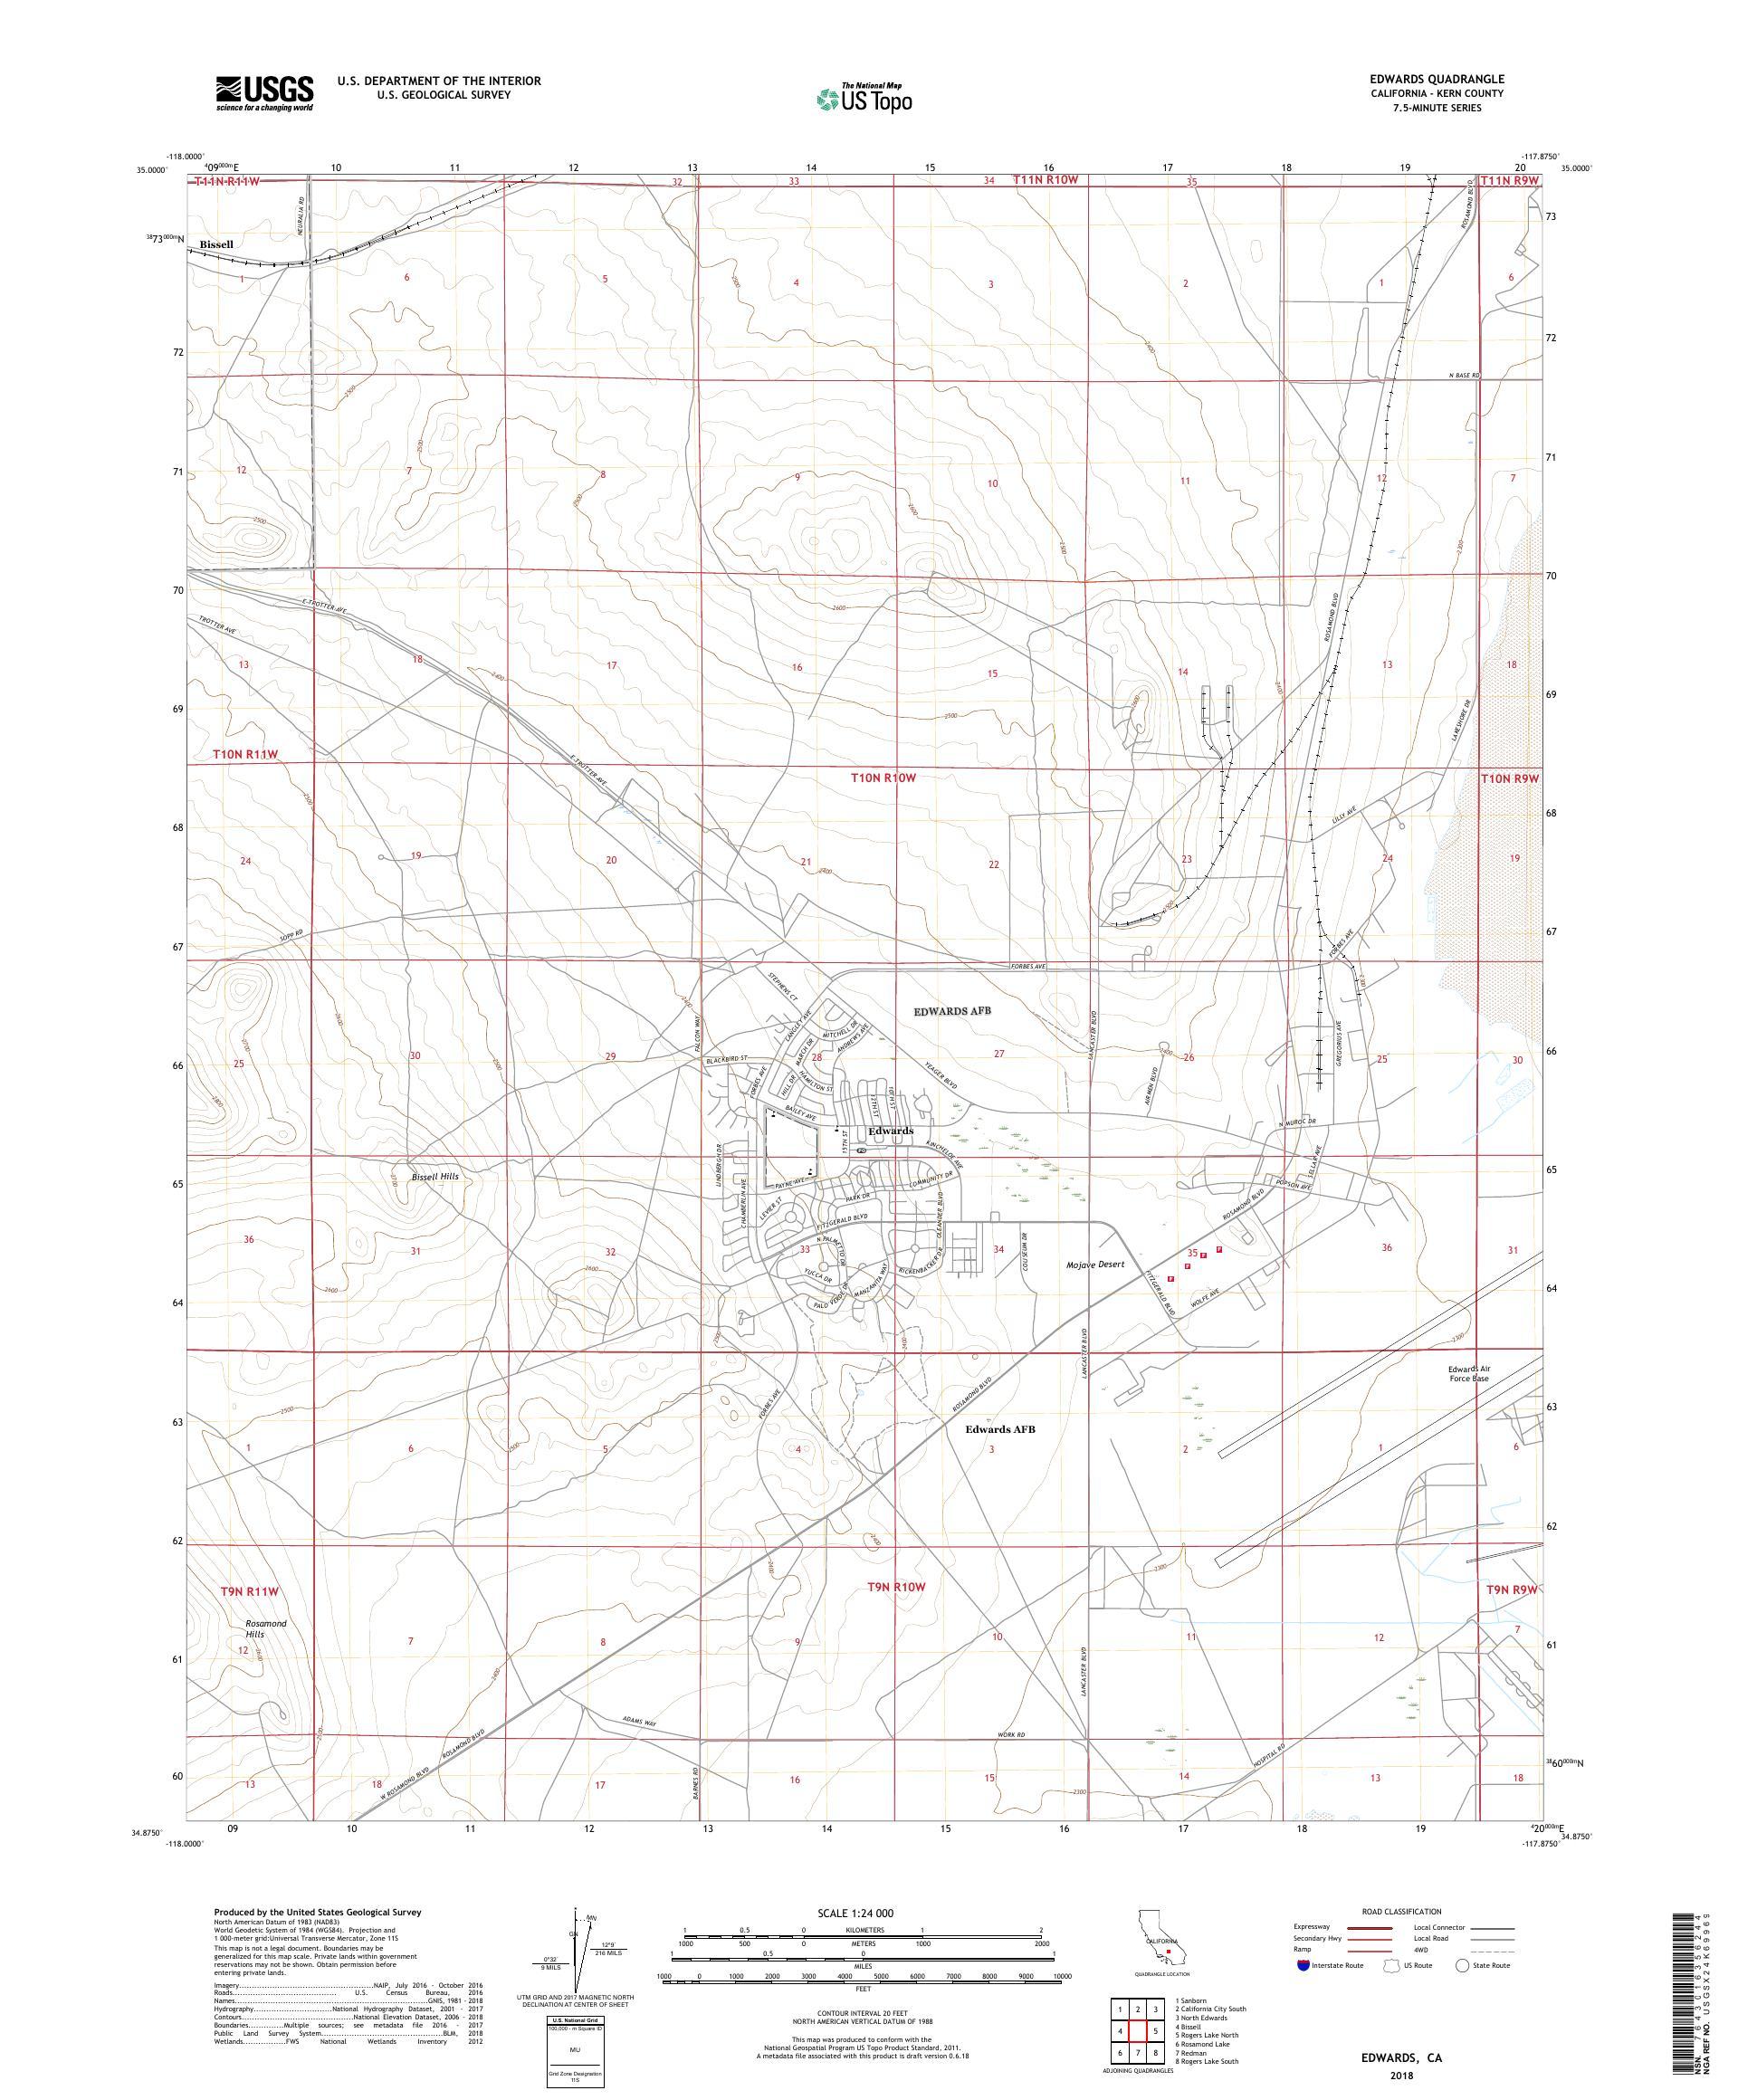 MyTopo Edwards, California USGS Quad Topo Map on